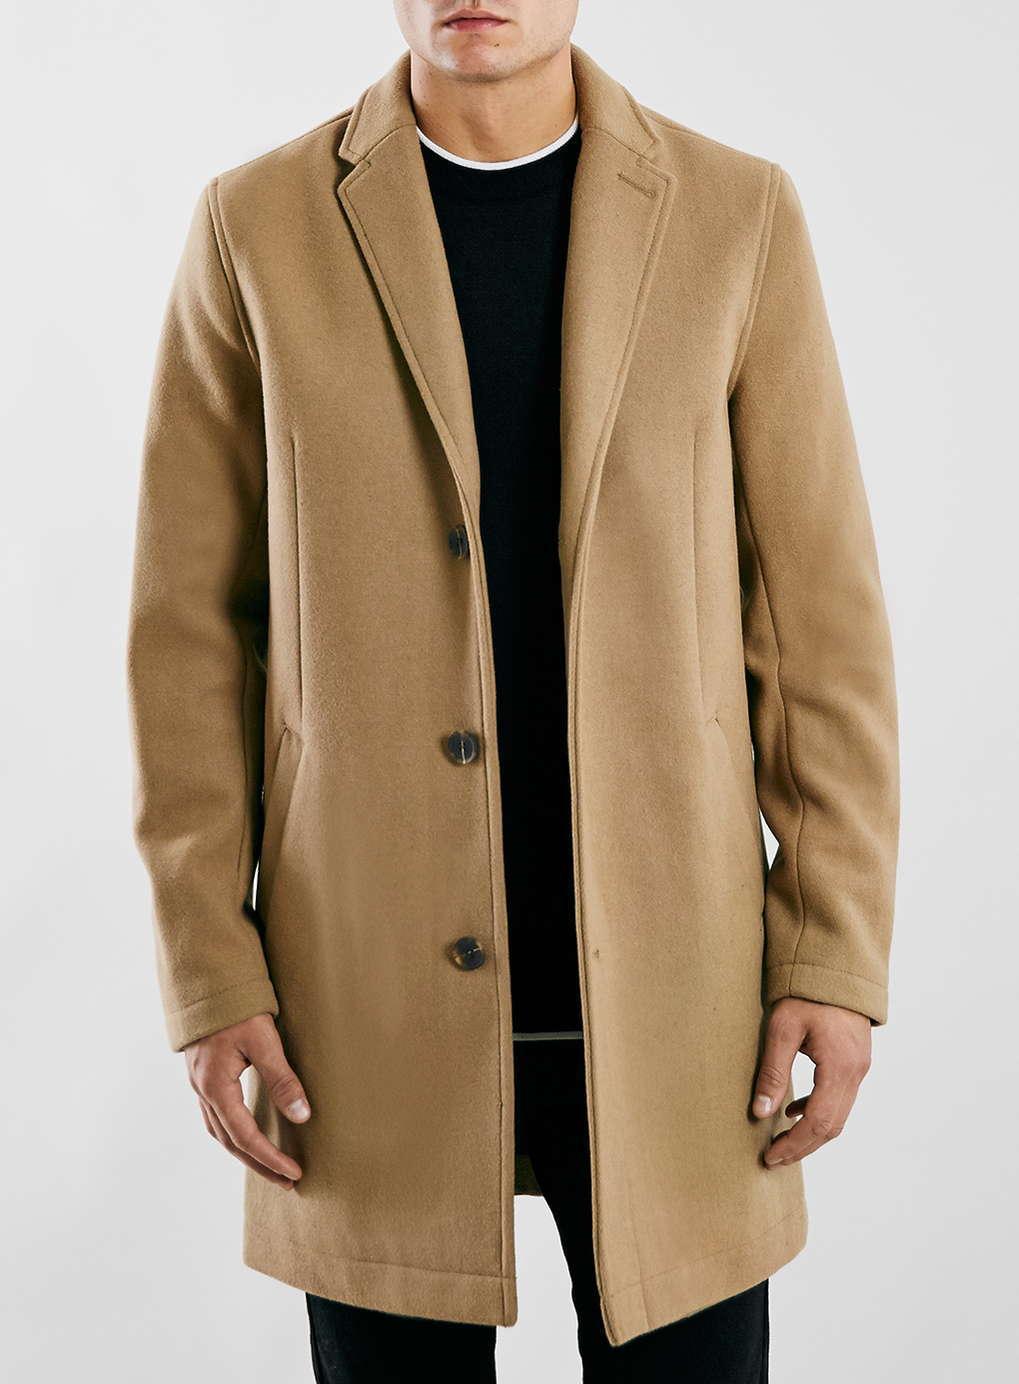 Camel Wool Blend Overcoat-topman